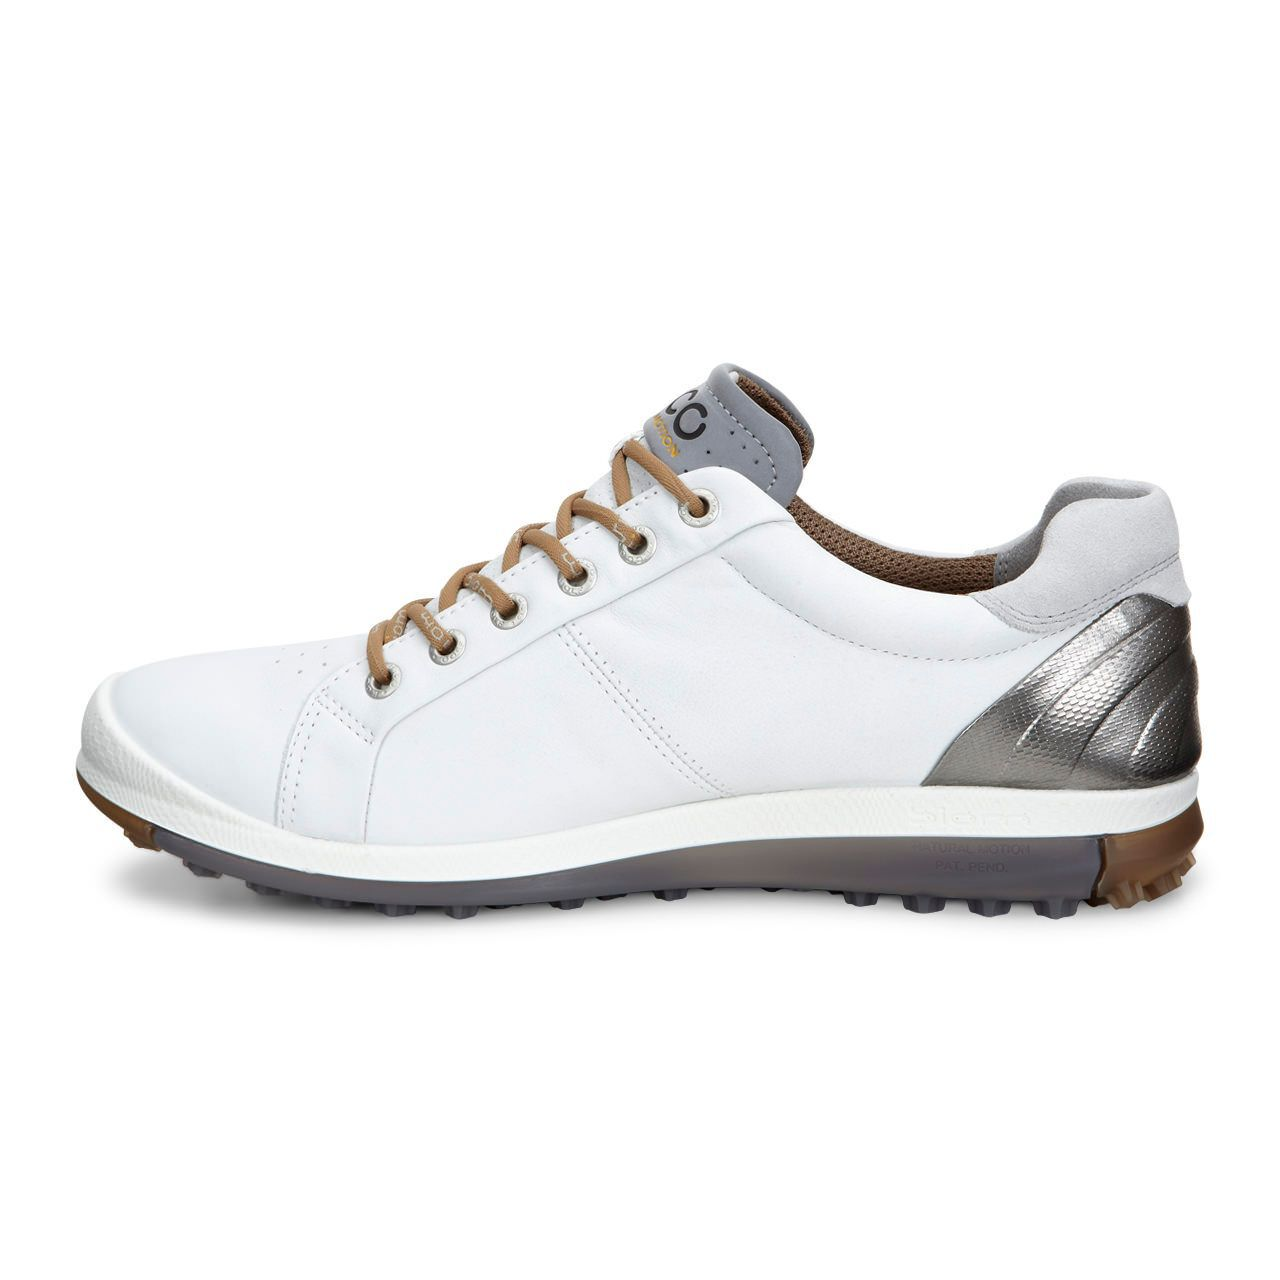 Mens Shoes ECCO Golf Biom Golf White/Mineral